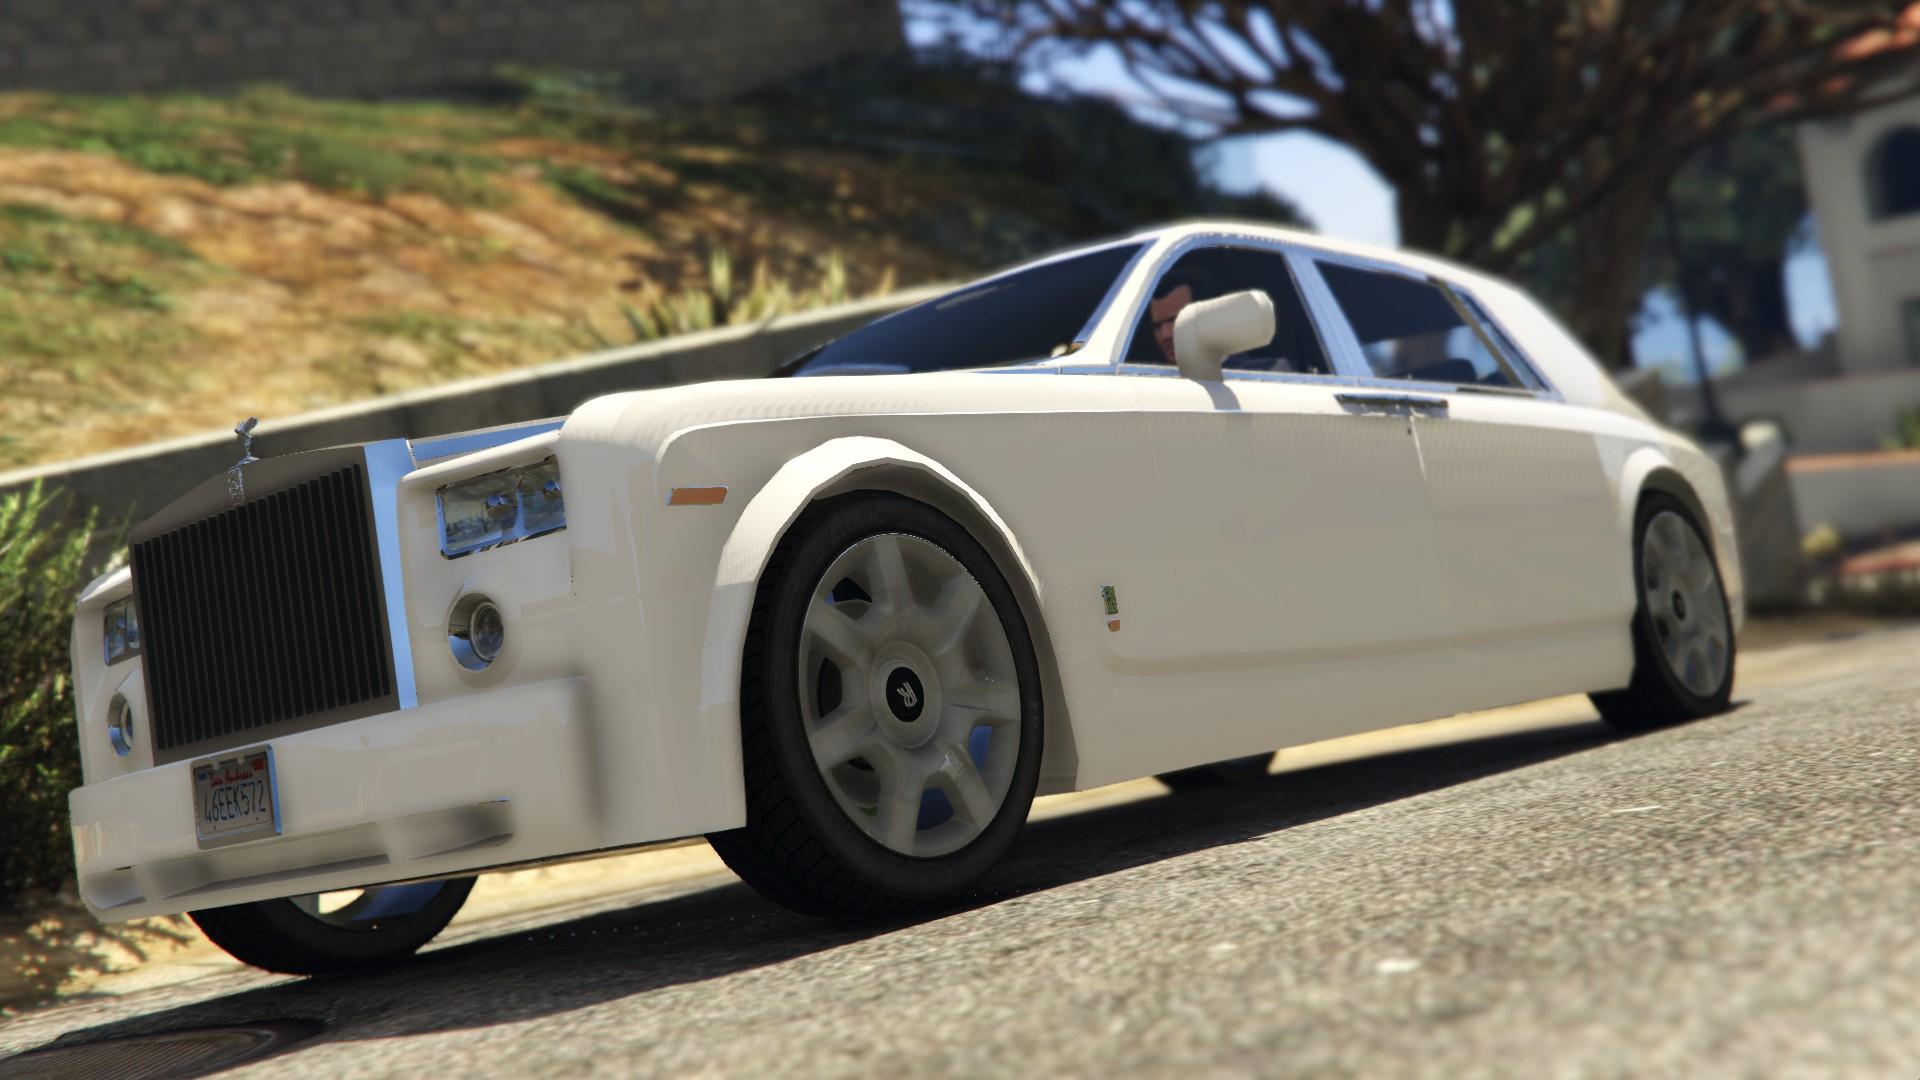 Rolls Royce Phantom Ewb Gta5 Mods Com